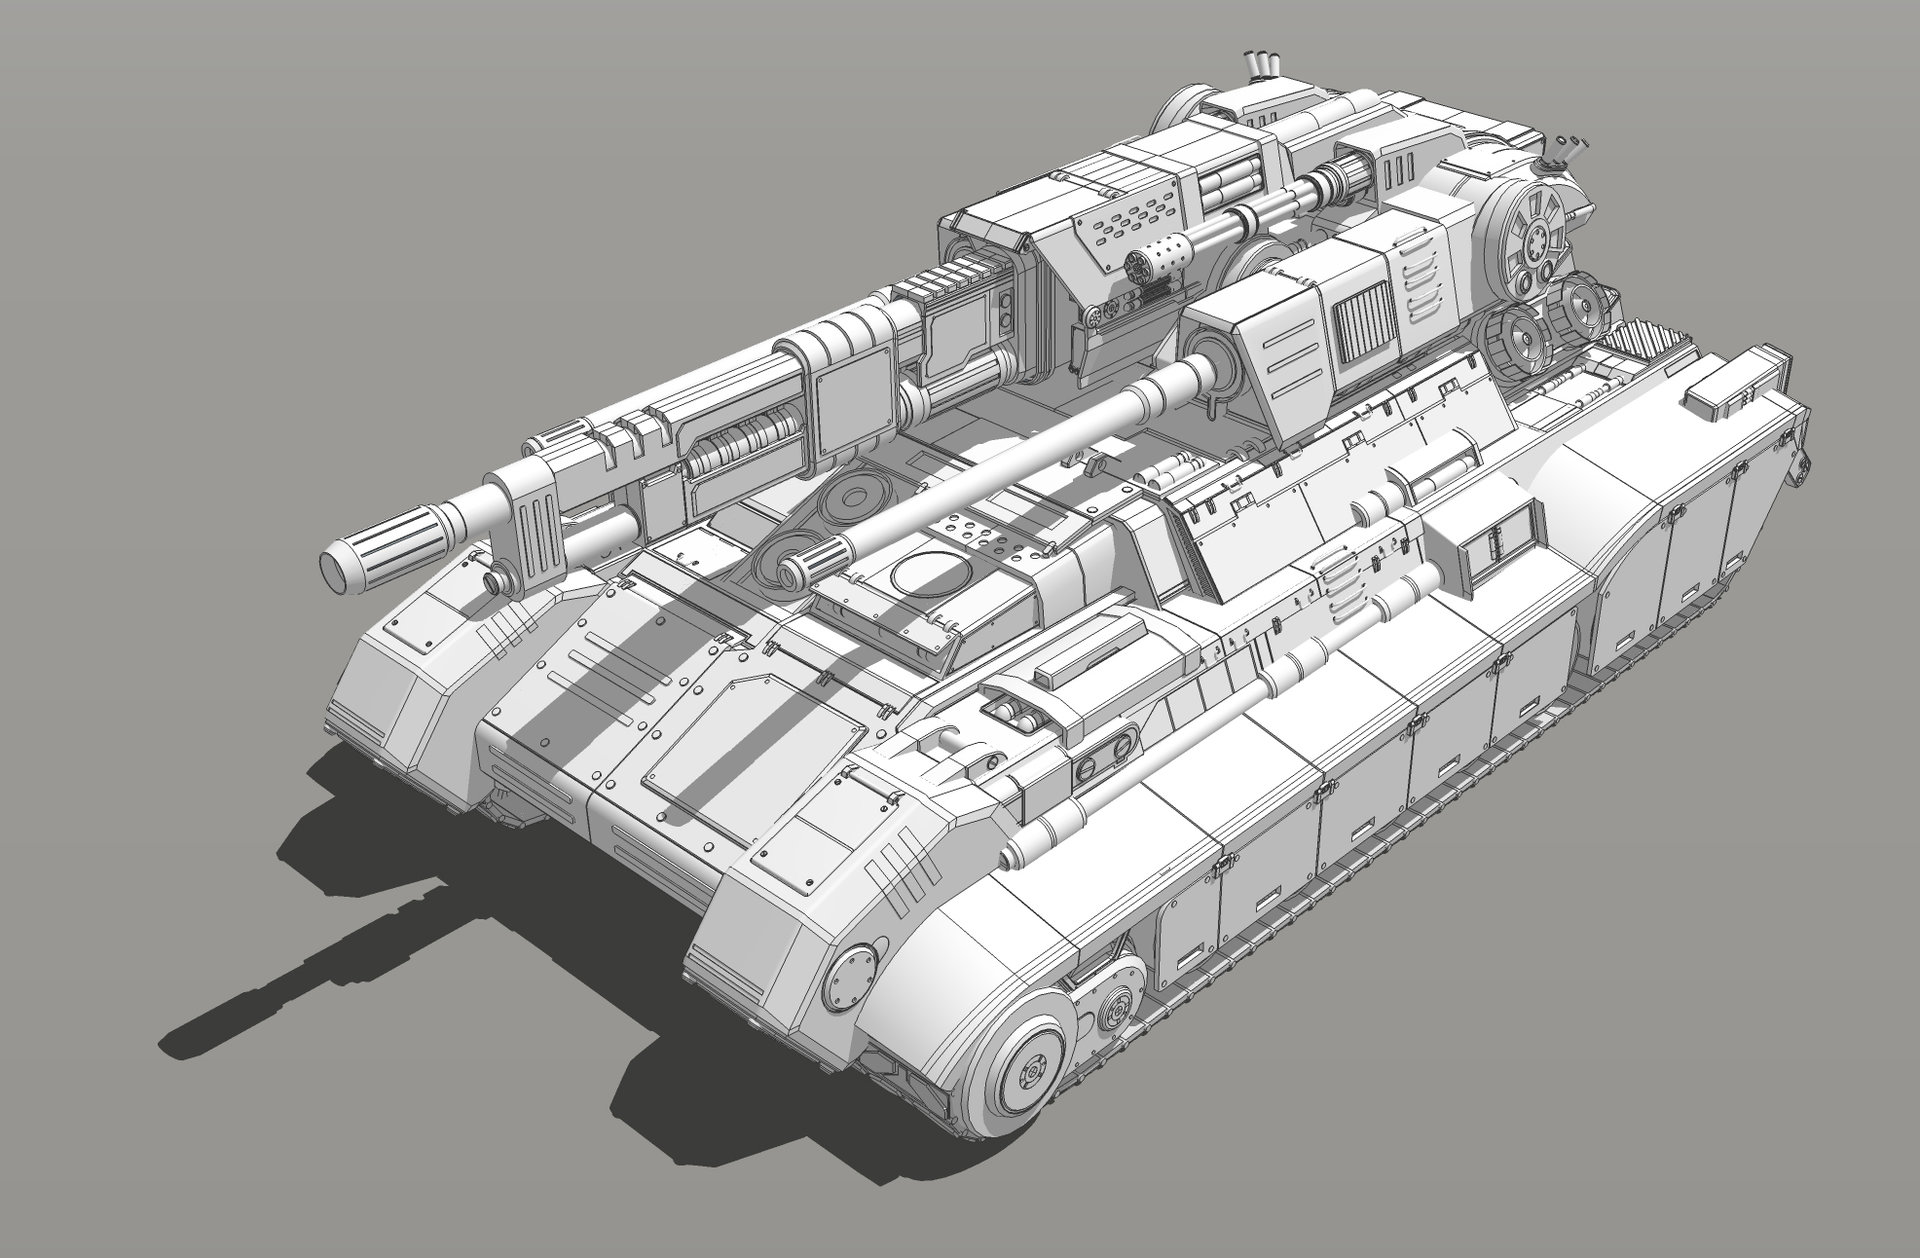 Muyoung kim armor grendal tank concept v6 kr 6